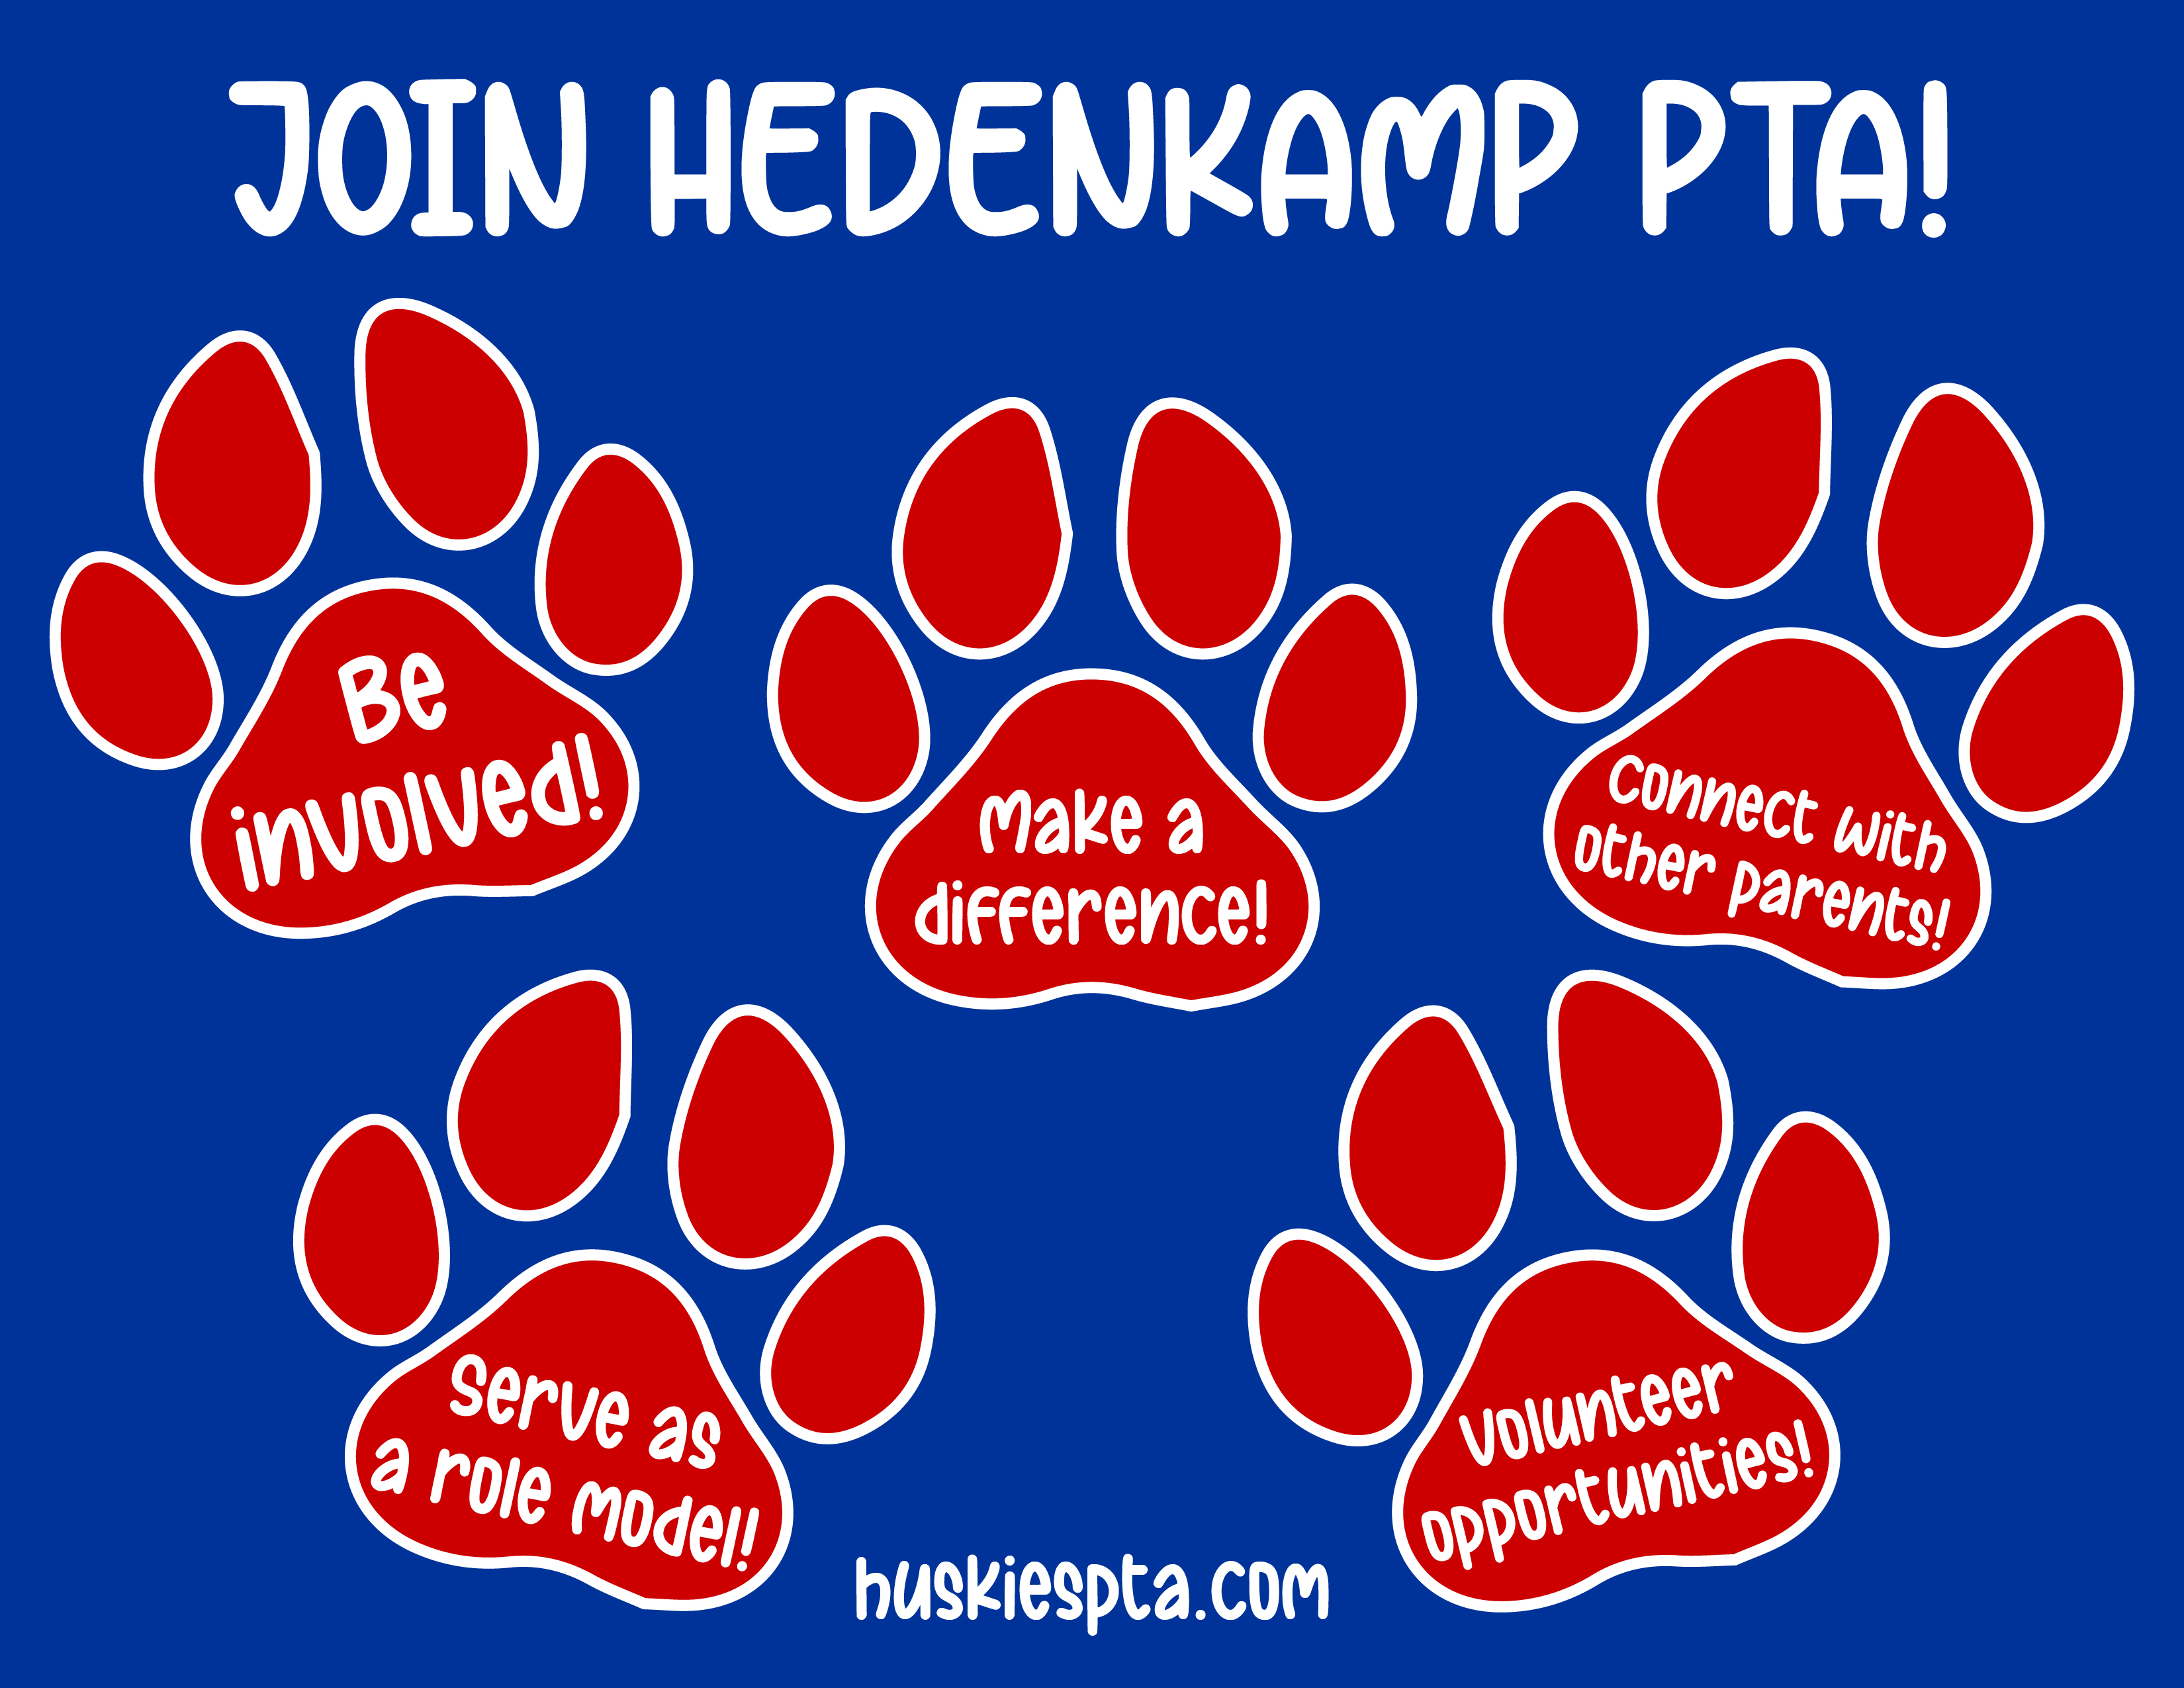 HED PTA Membership web graphic